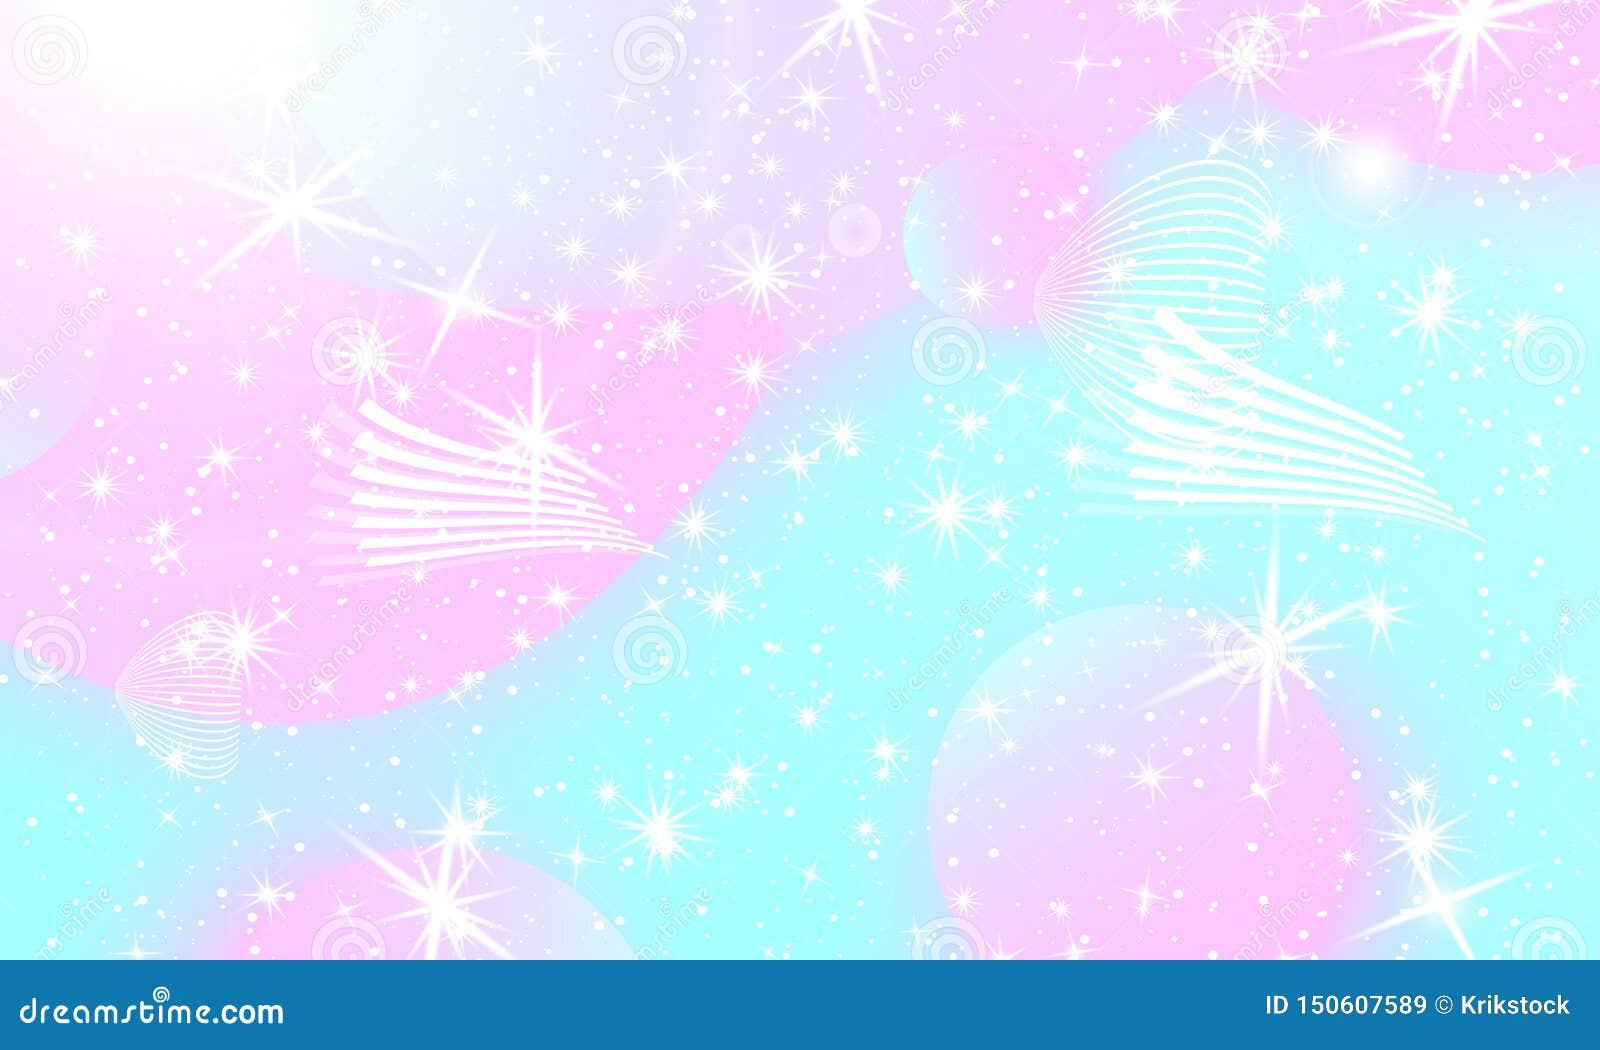 fairy background unicorn pattern mermaid rainbow galaxy fantasy stars pastel colors princess color waves kawaii 150607589